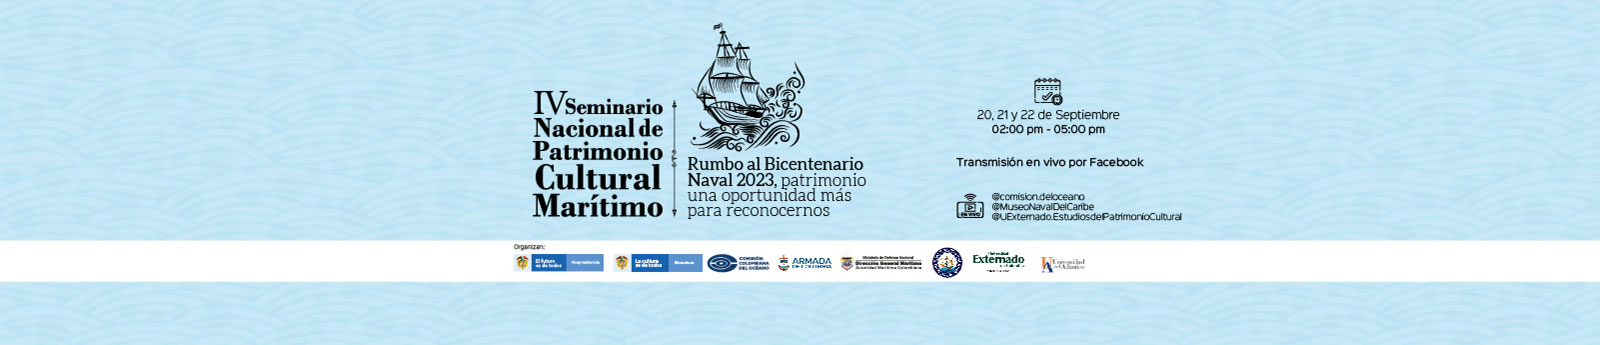 IV Seminario Nacional de Patrimonio Cultural Marítimo